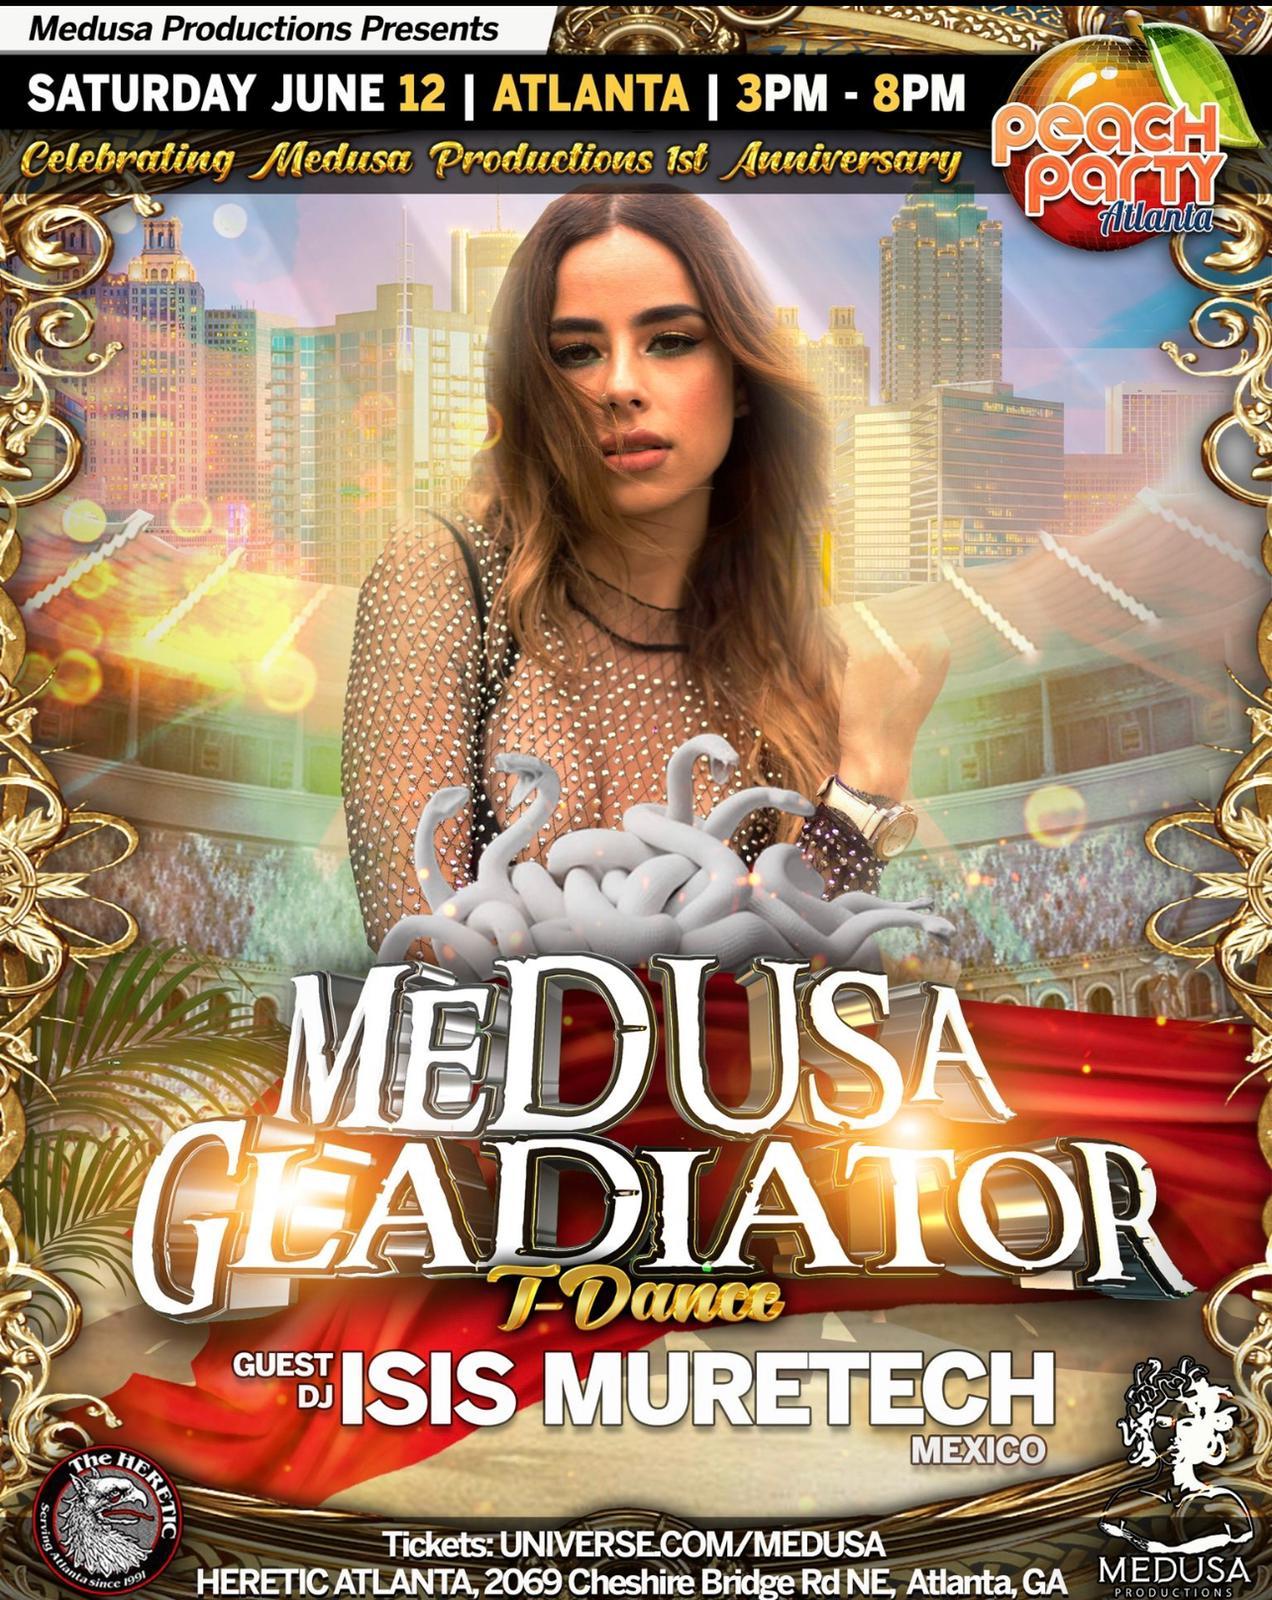 Medusa Gladiator with DJ Isis Muretech